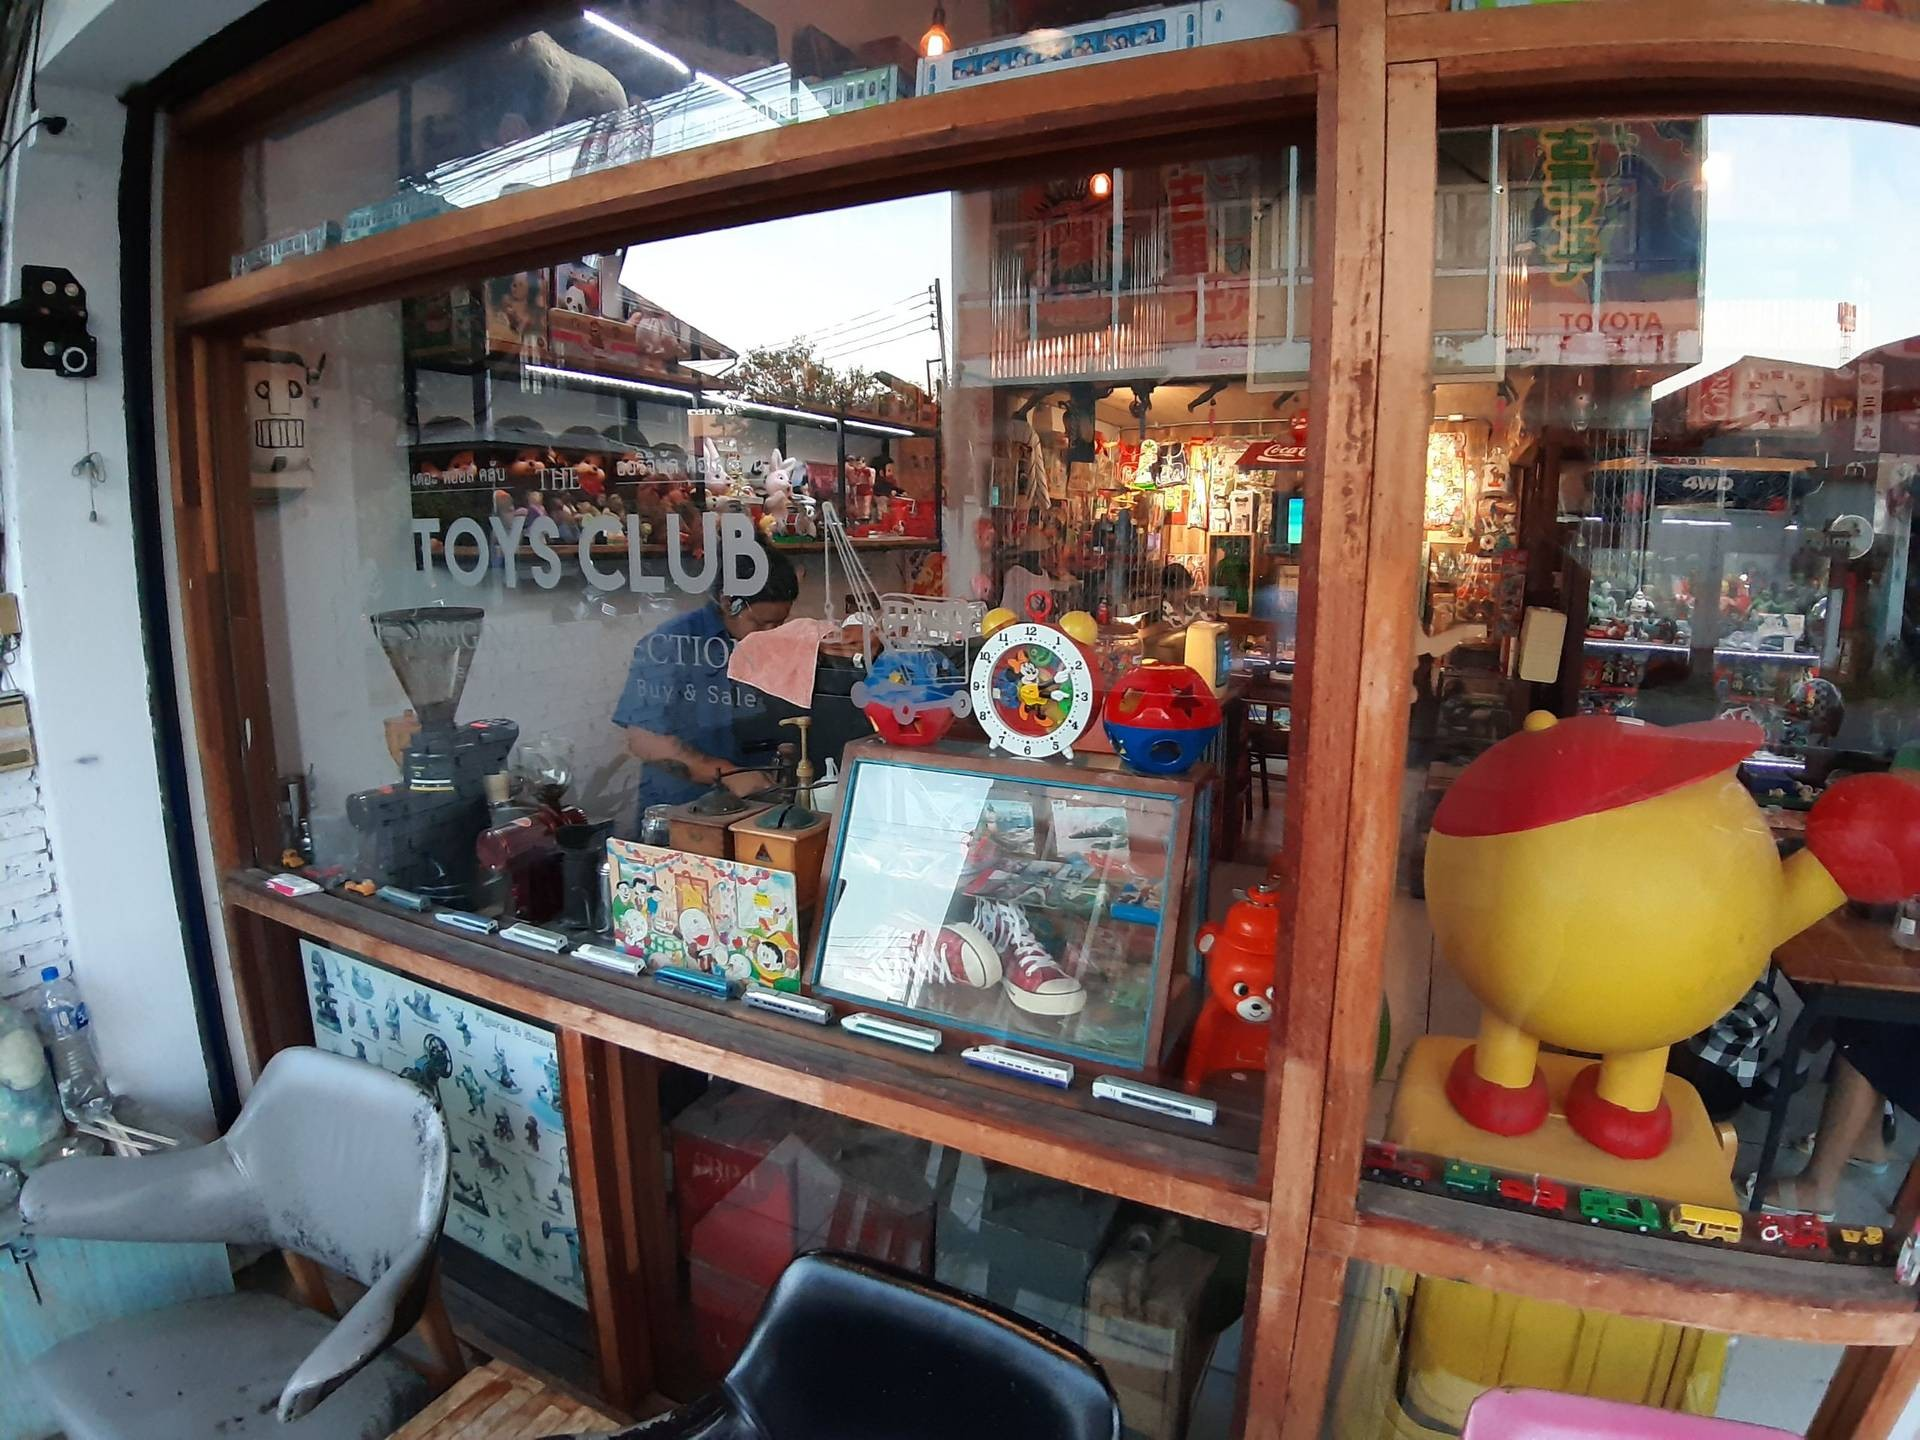 Toy Shop & บดิศร Slow Bar